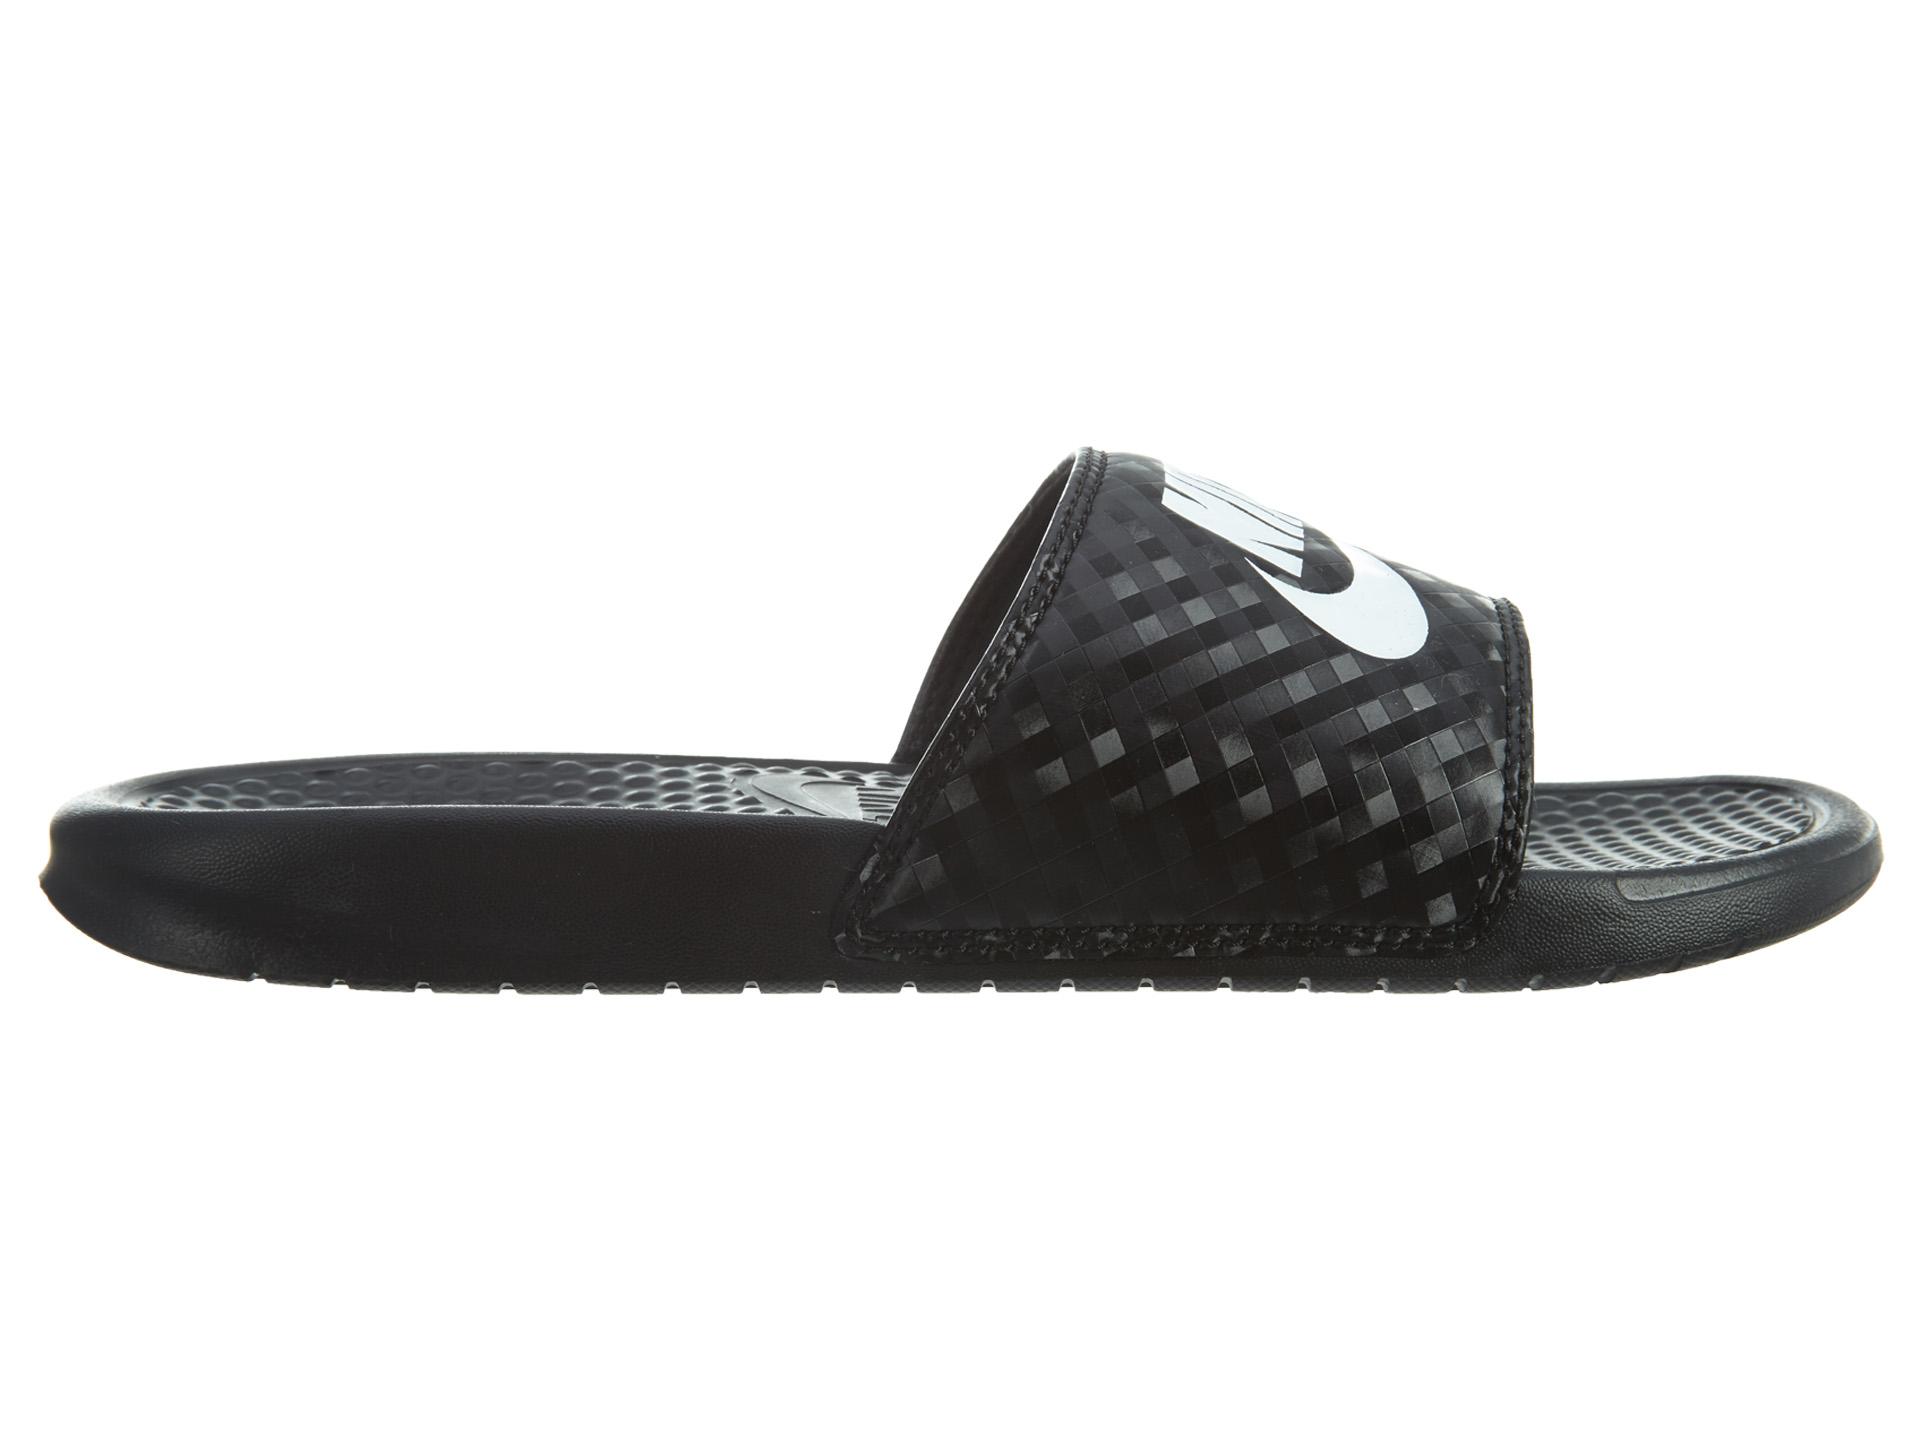 Nike Benassi Jdi Black White (W